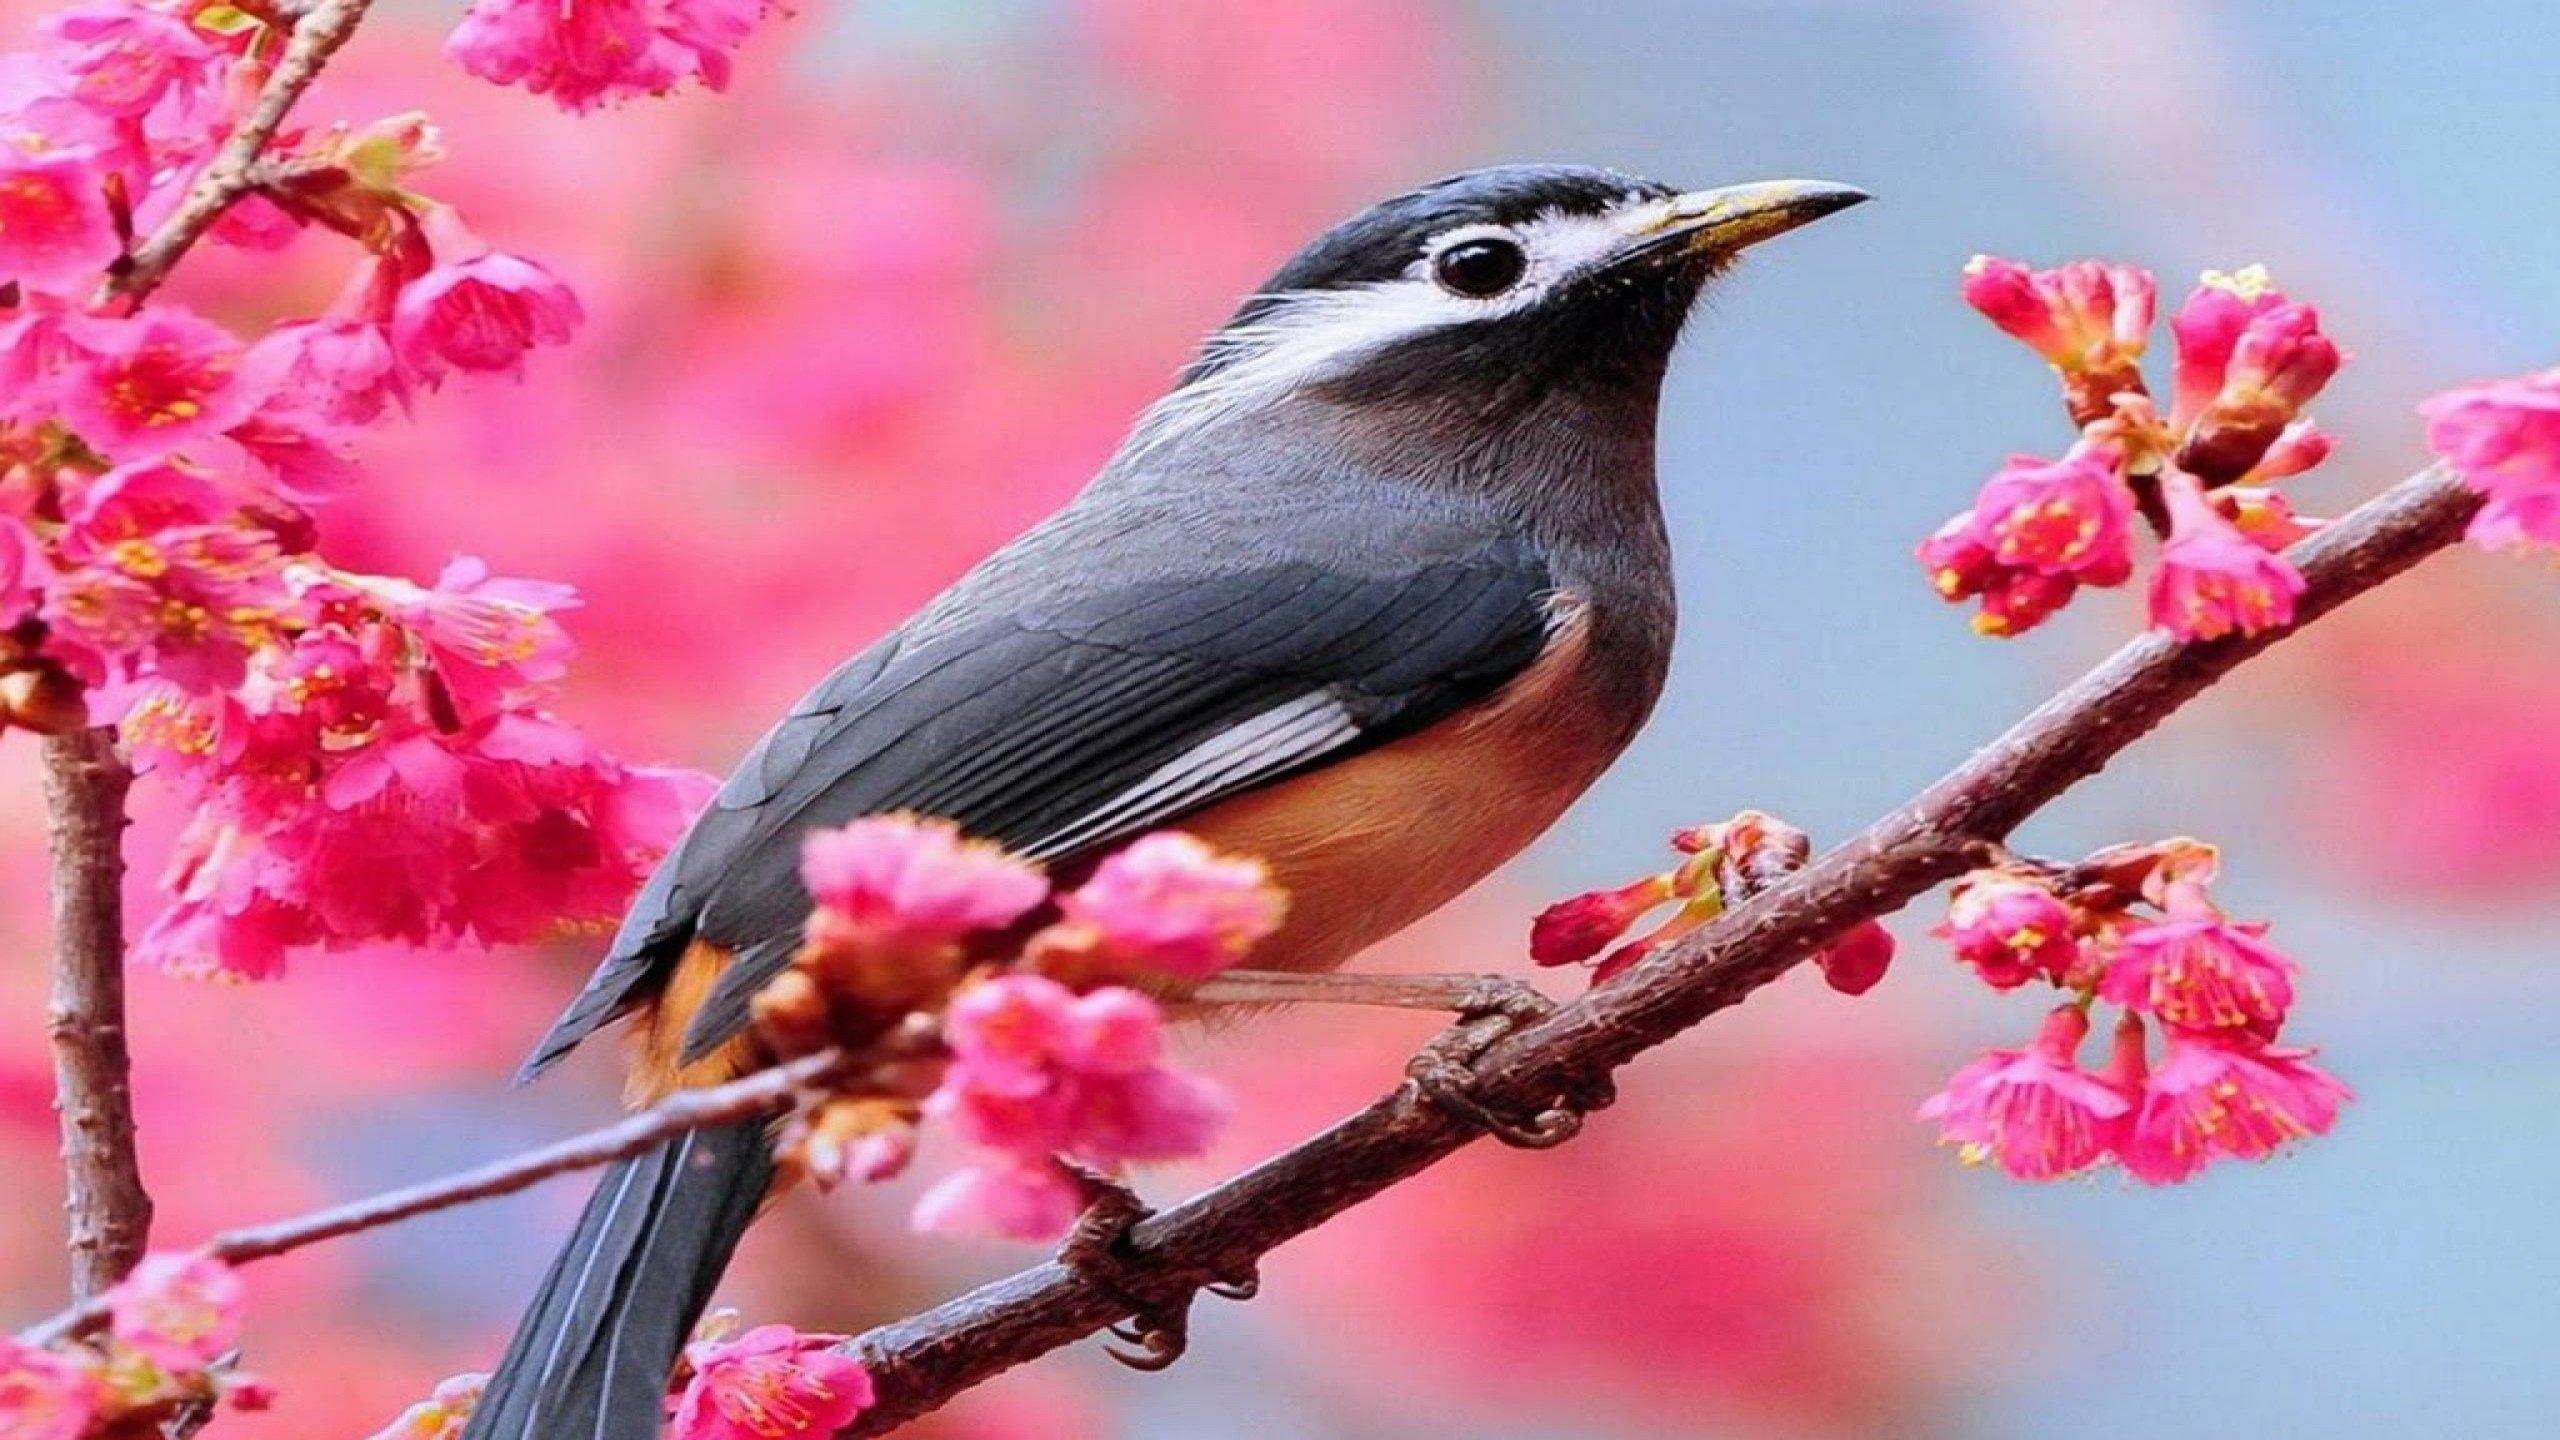 Bird Wallpapers Photos And Desktop Backgrounds Up To 8K 7680x4320